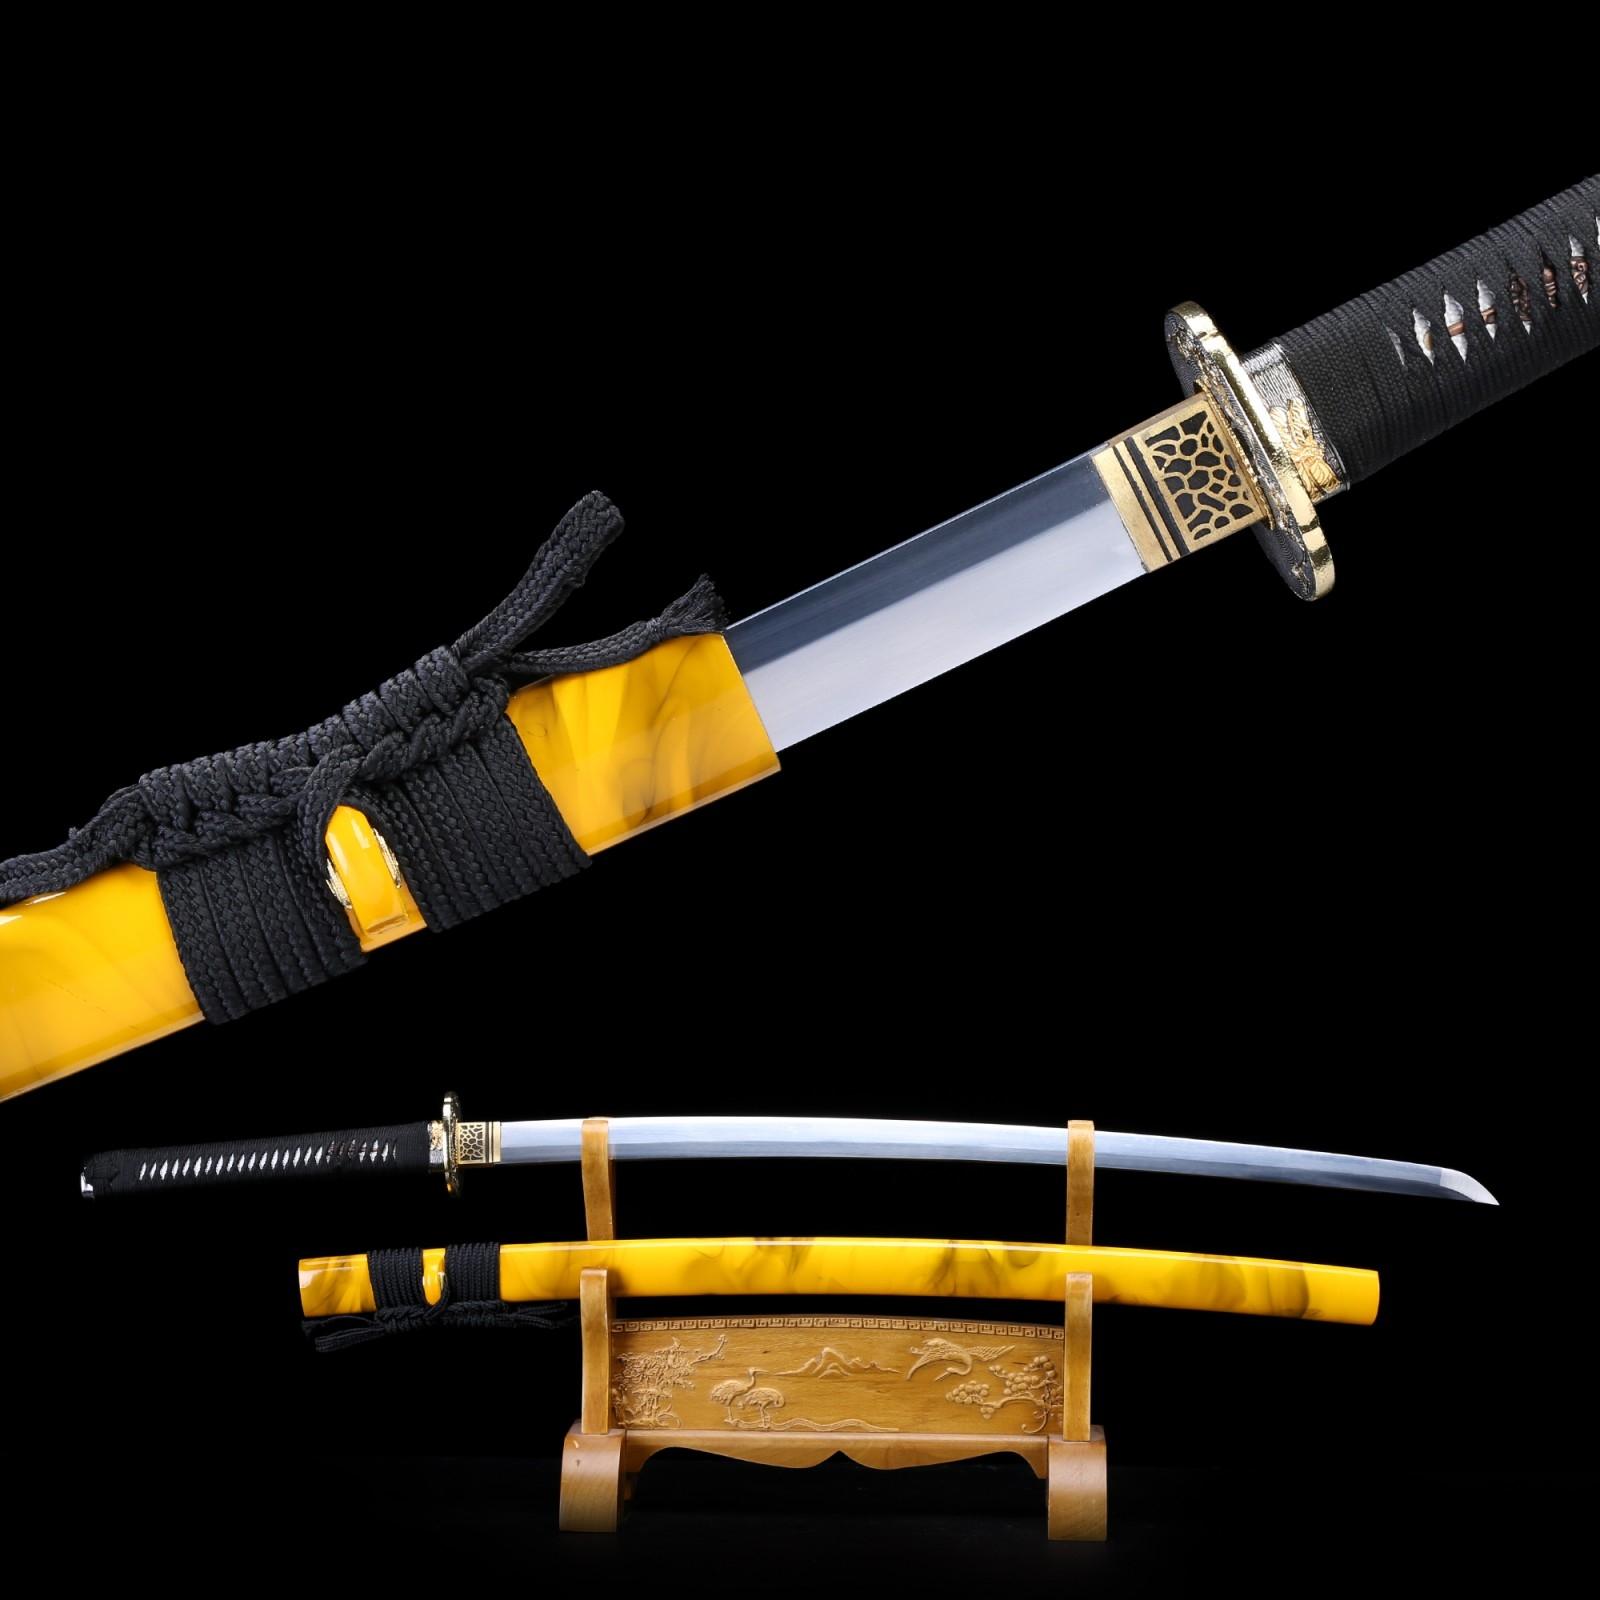 Handmade Full Tang Spring Steel Yellow Saya Katana Japanese Samurai Swords